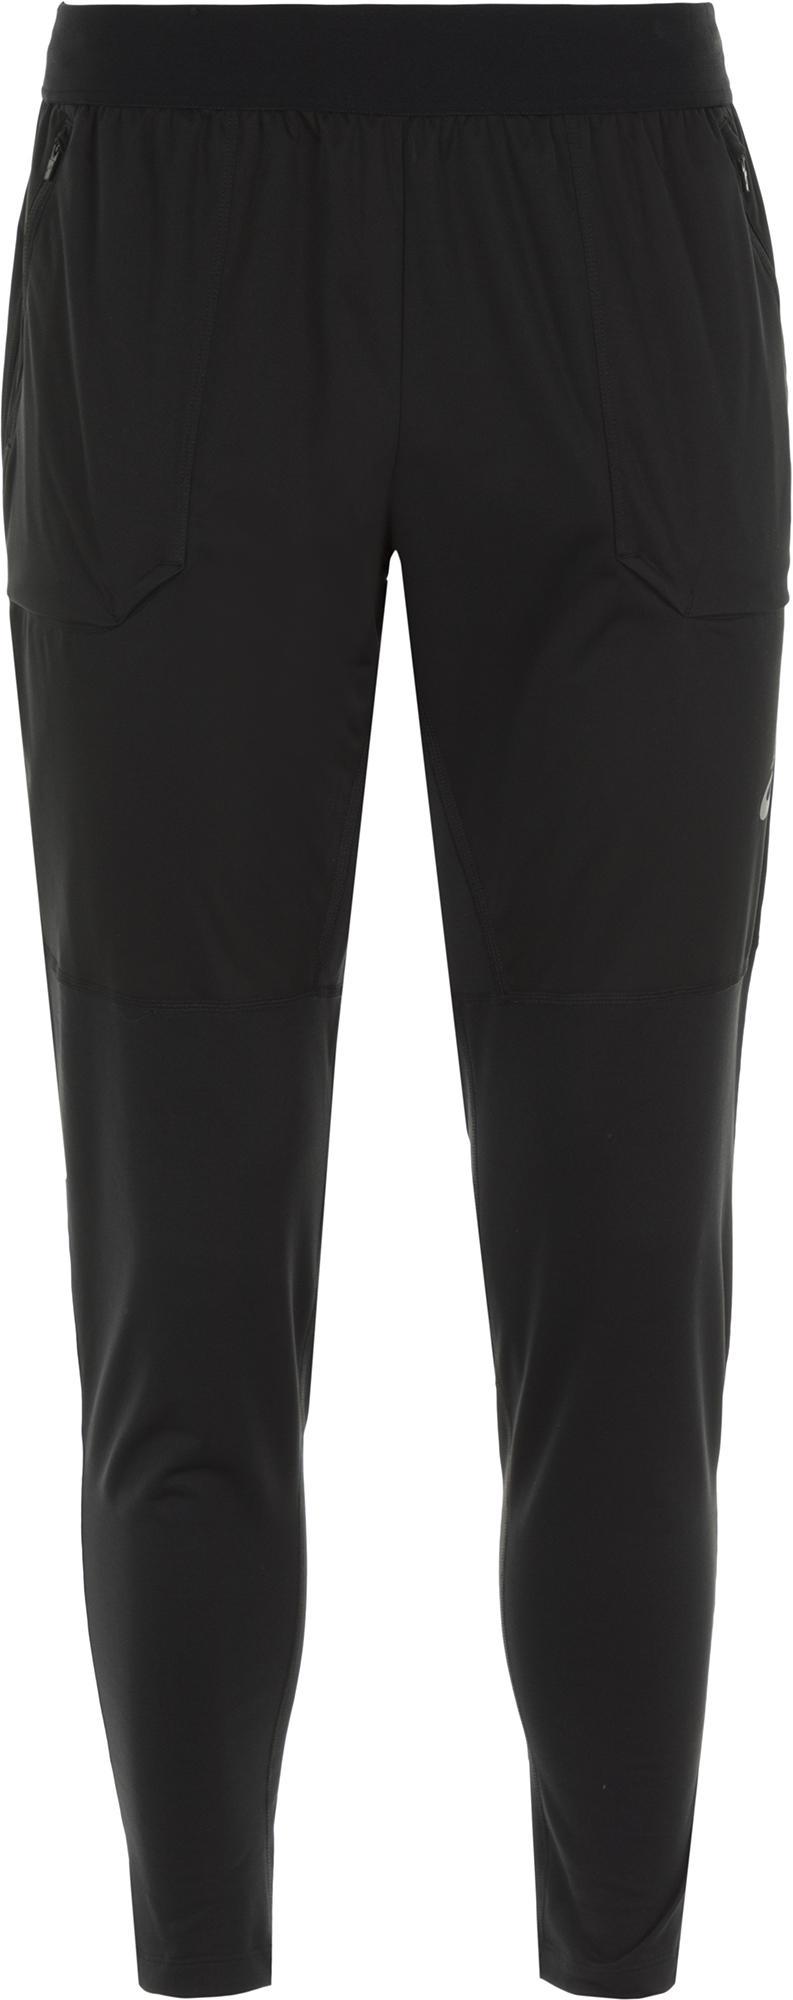 Фото - ASICS Брюки мужские ASICS Accelerate, размер 52-54 available from 10 11 asics comprehensive training trousers 141218 1113